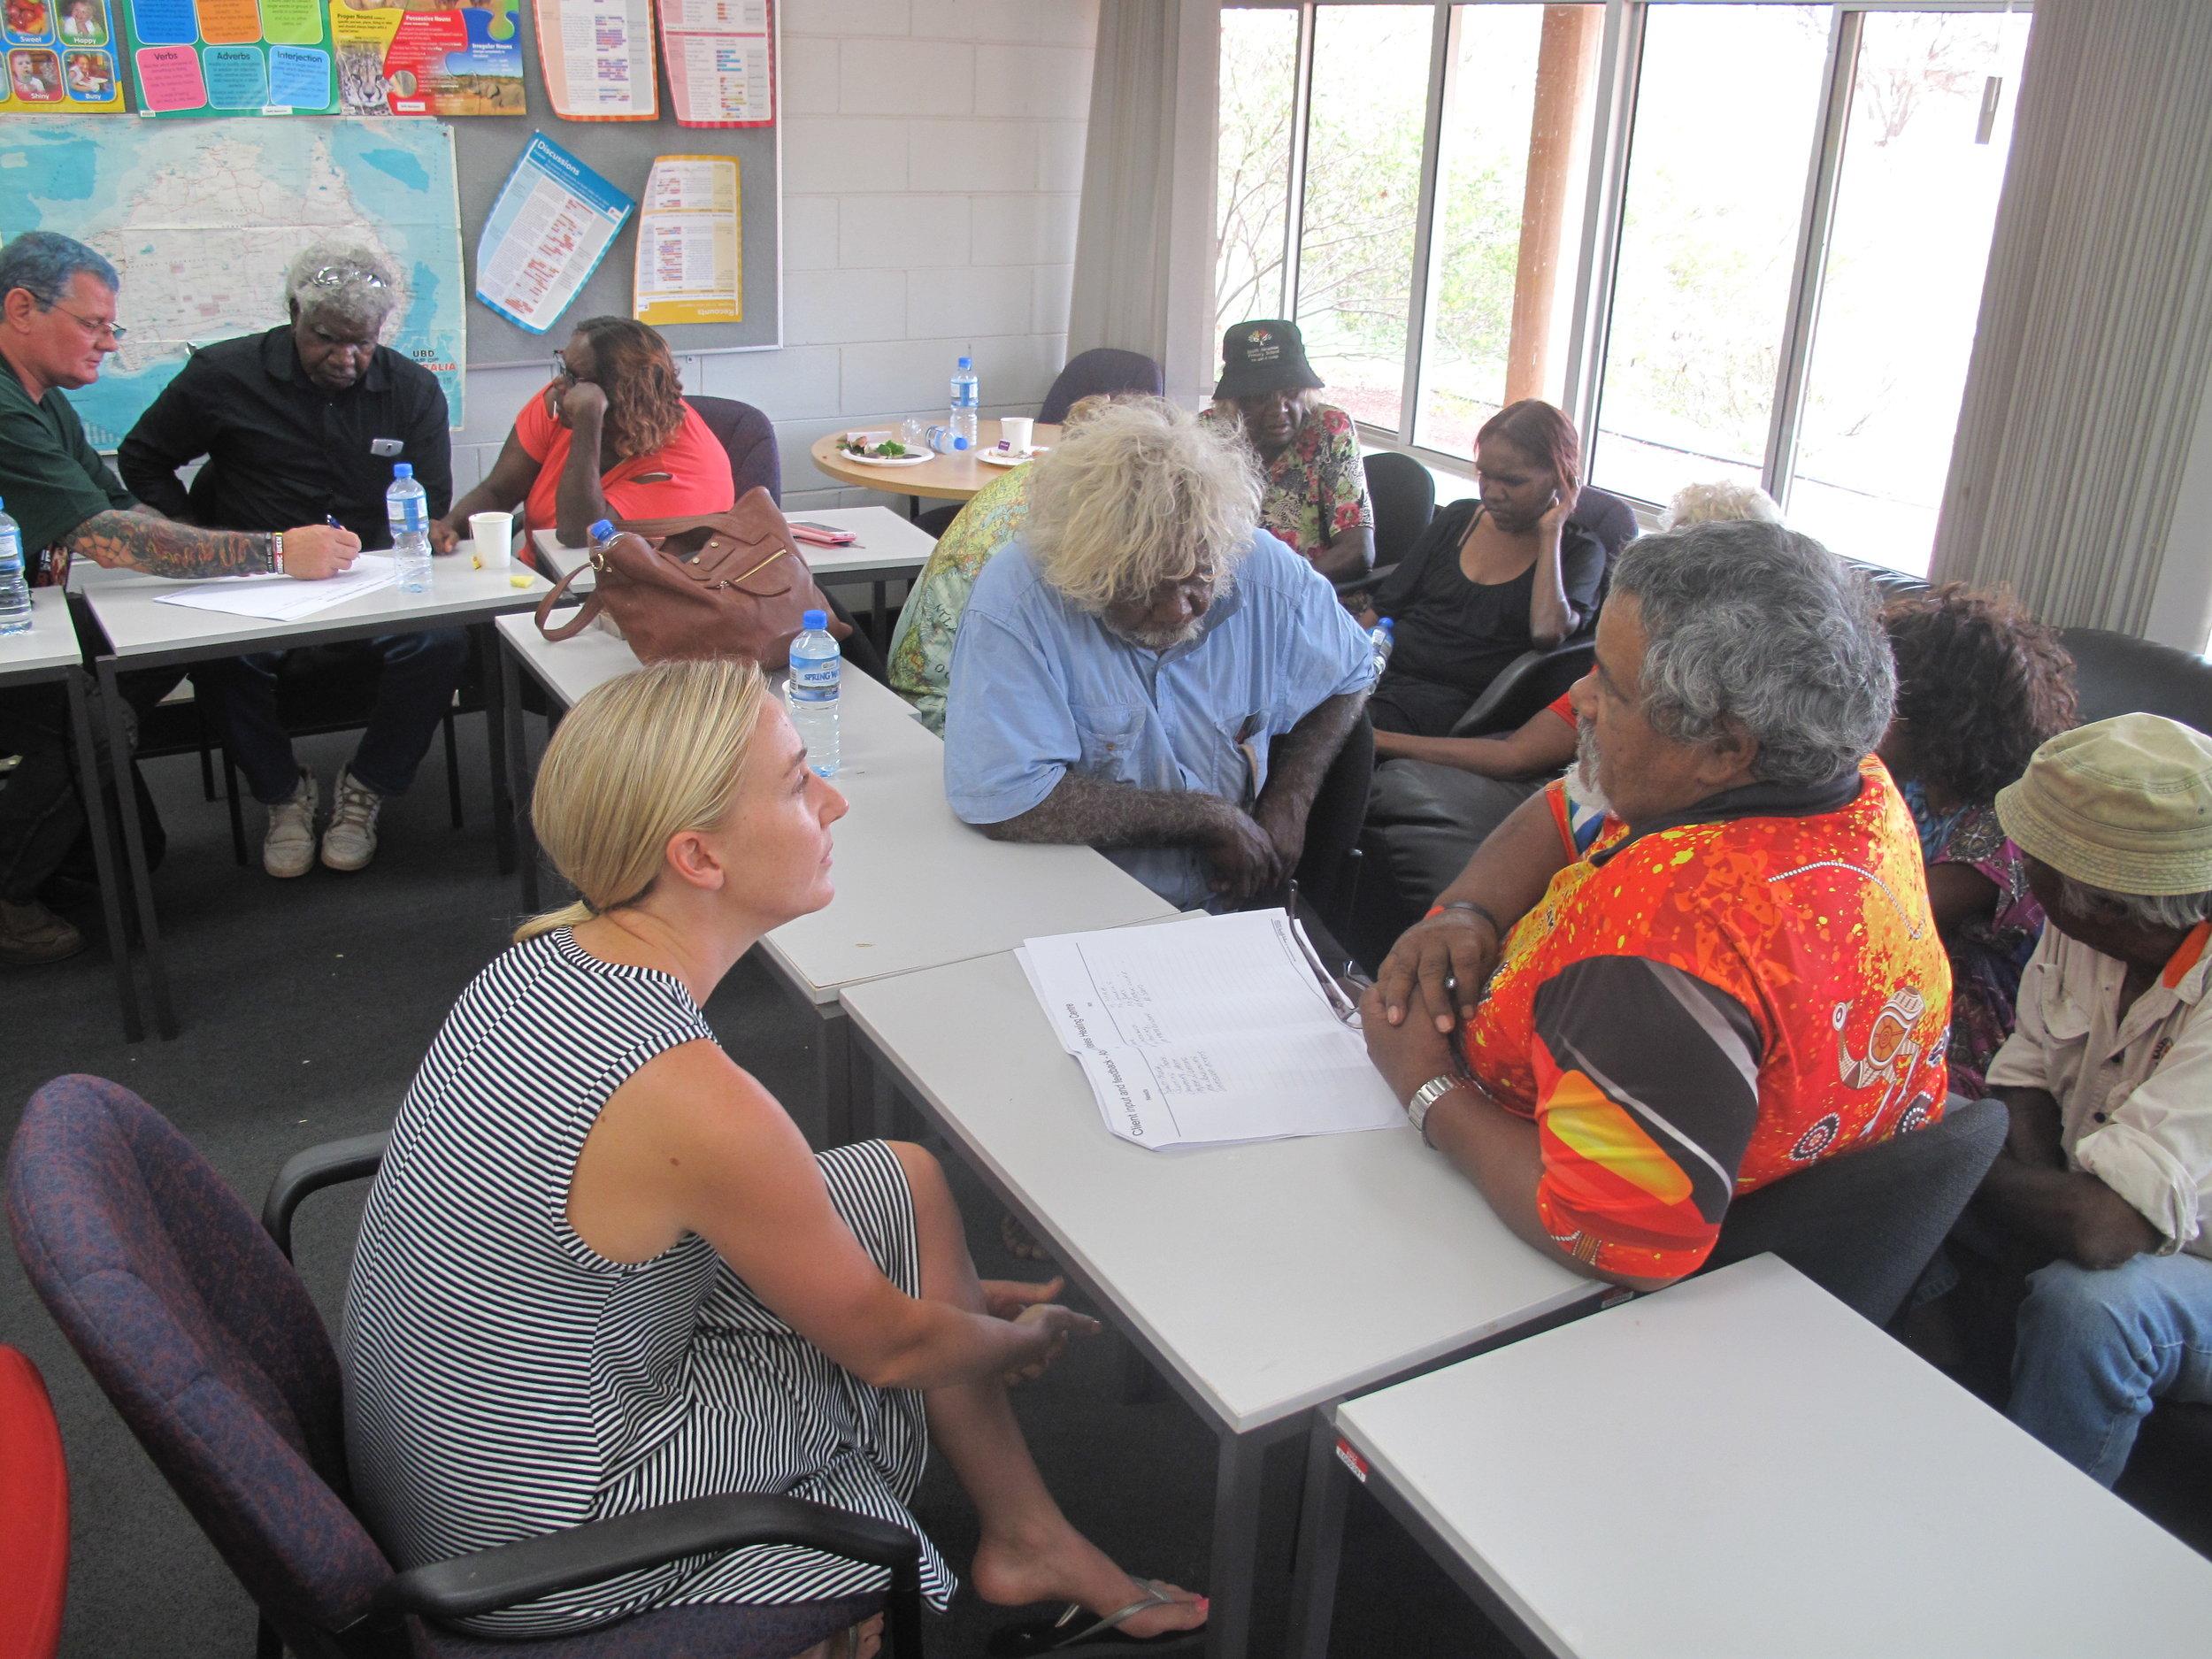 [PHOTO: ICV Volunteer Kayla (left) talking with Pilbara community members]